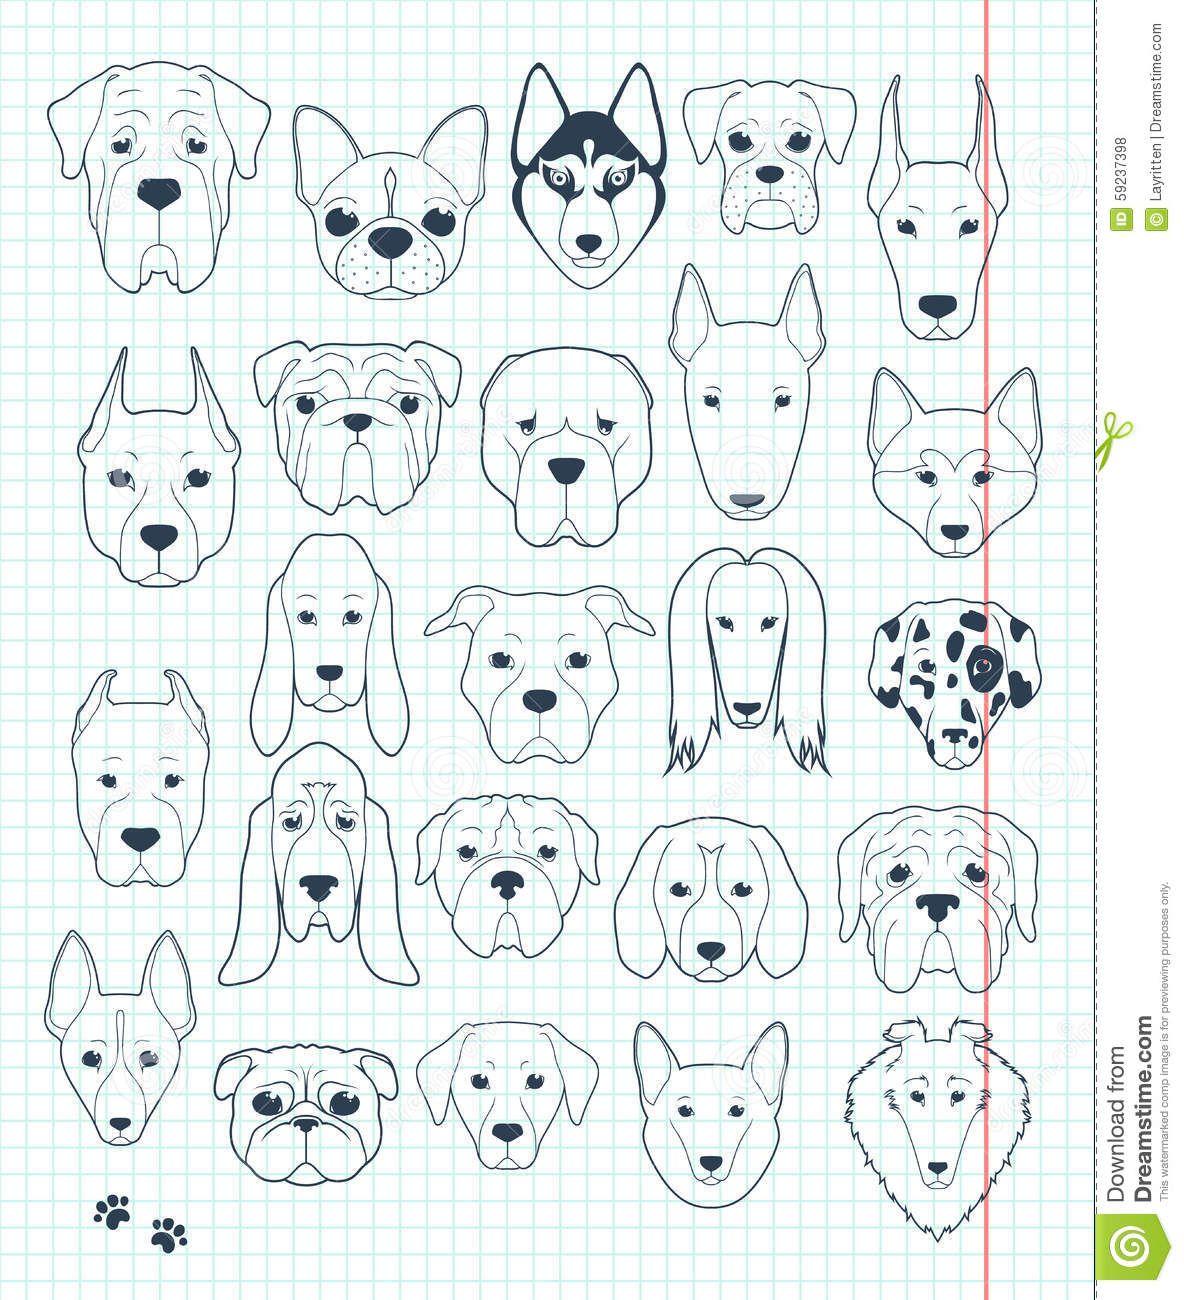 Set Of Sketches 24 Dogs Different Breeds Handmade Head Dog Illustration About Graphic Dachshund Basenji Labrador Al Animal Doodles Doodle Dog Dog Tattoos